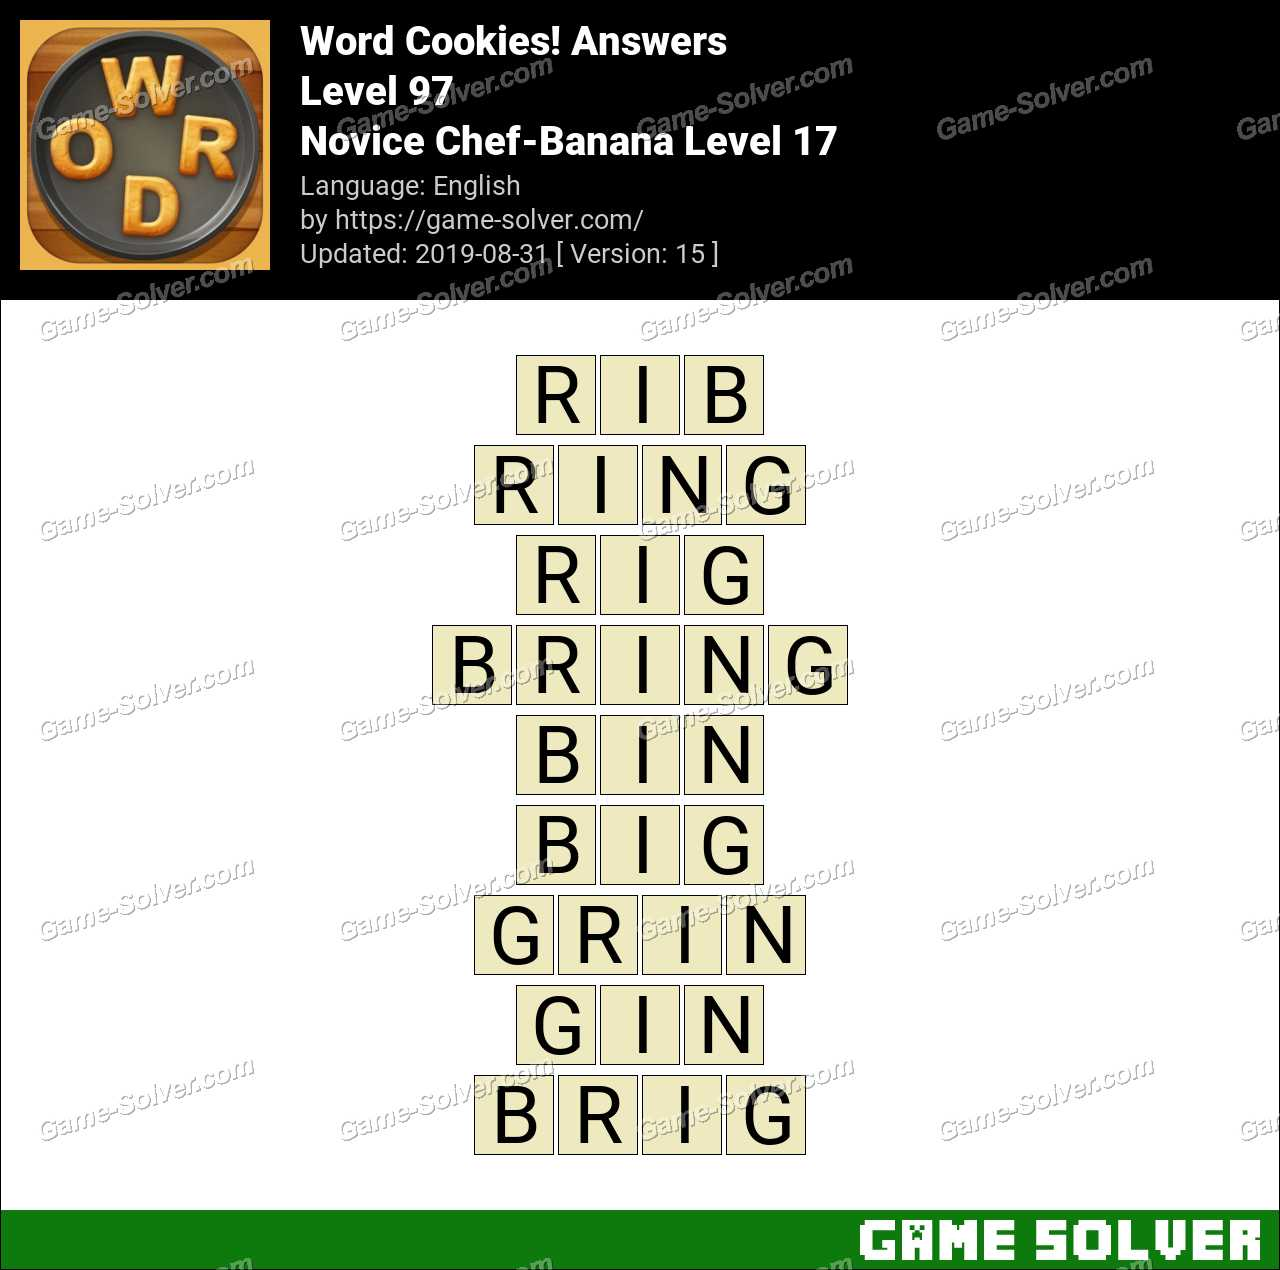 Word Cookies Novice Chef-Banana Level 17 Answers